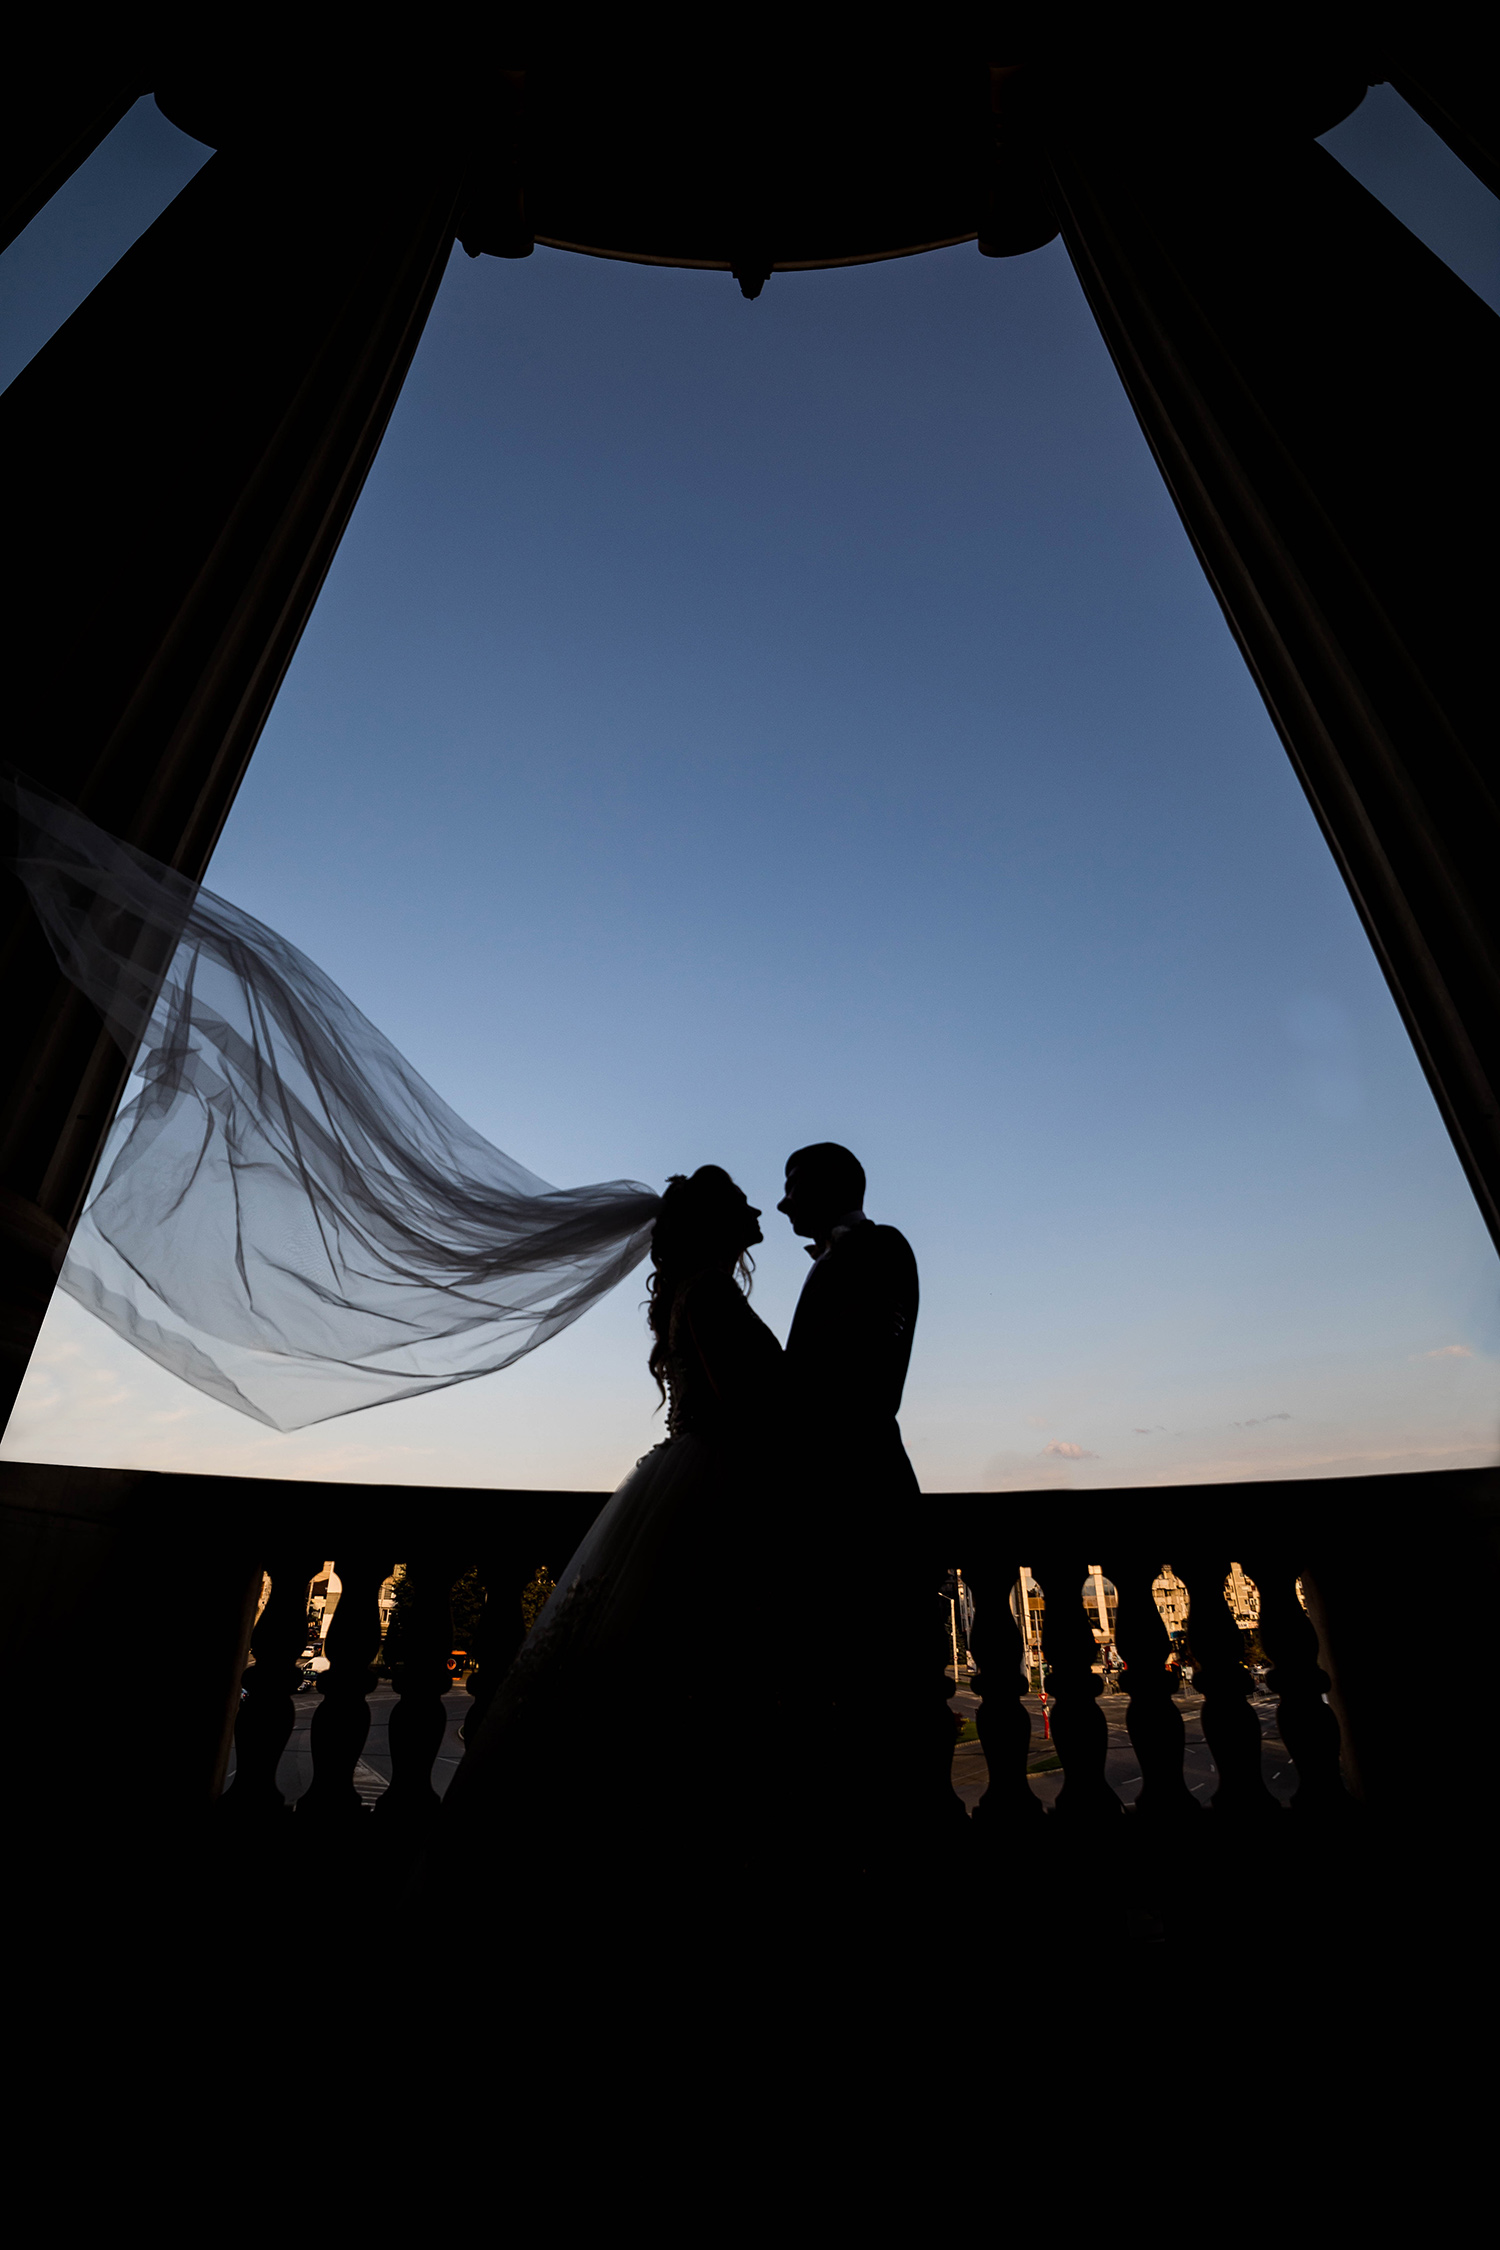 fotograf nunta iasi simona cosmin 010 1.jpg?scale.width=687&scale